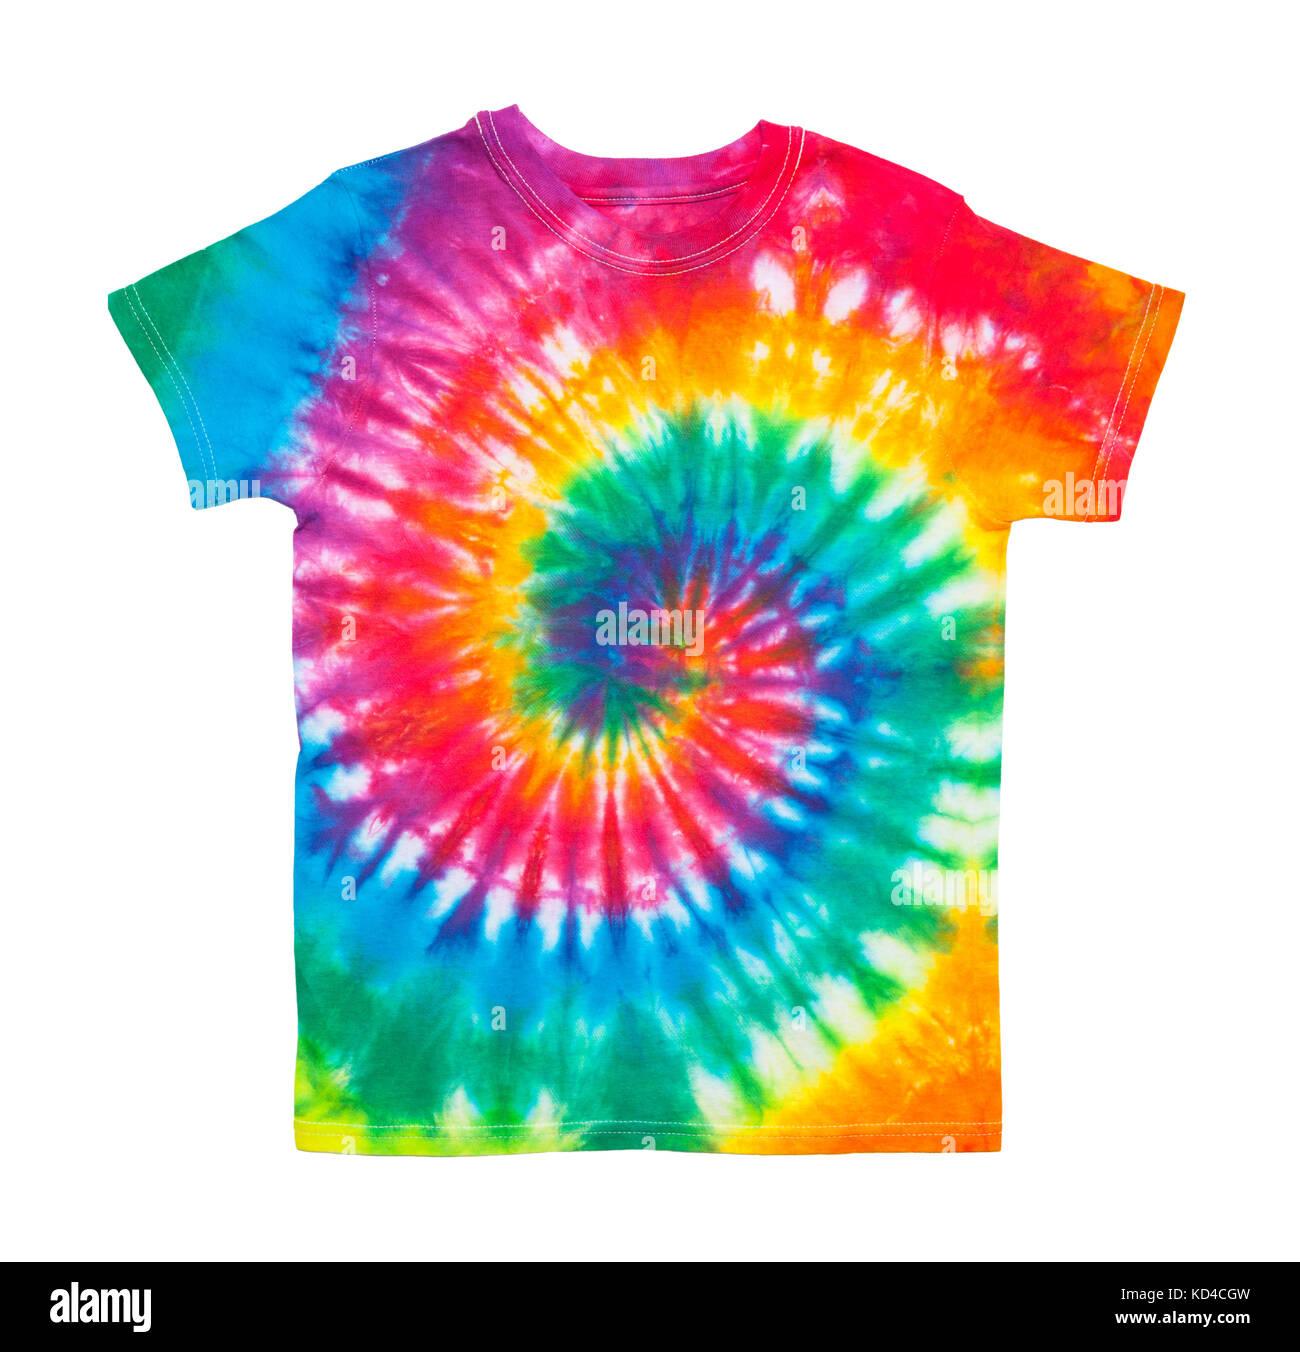 Tie Dye Shirt Patterns Spiral Summer Cook